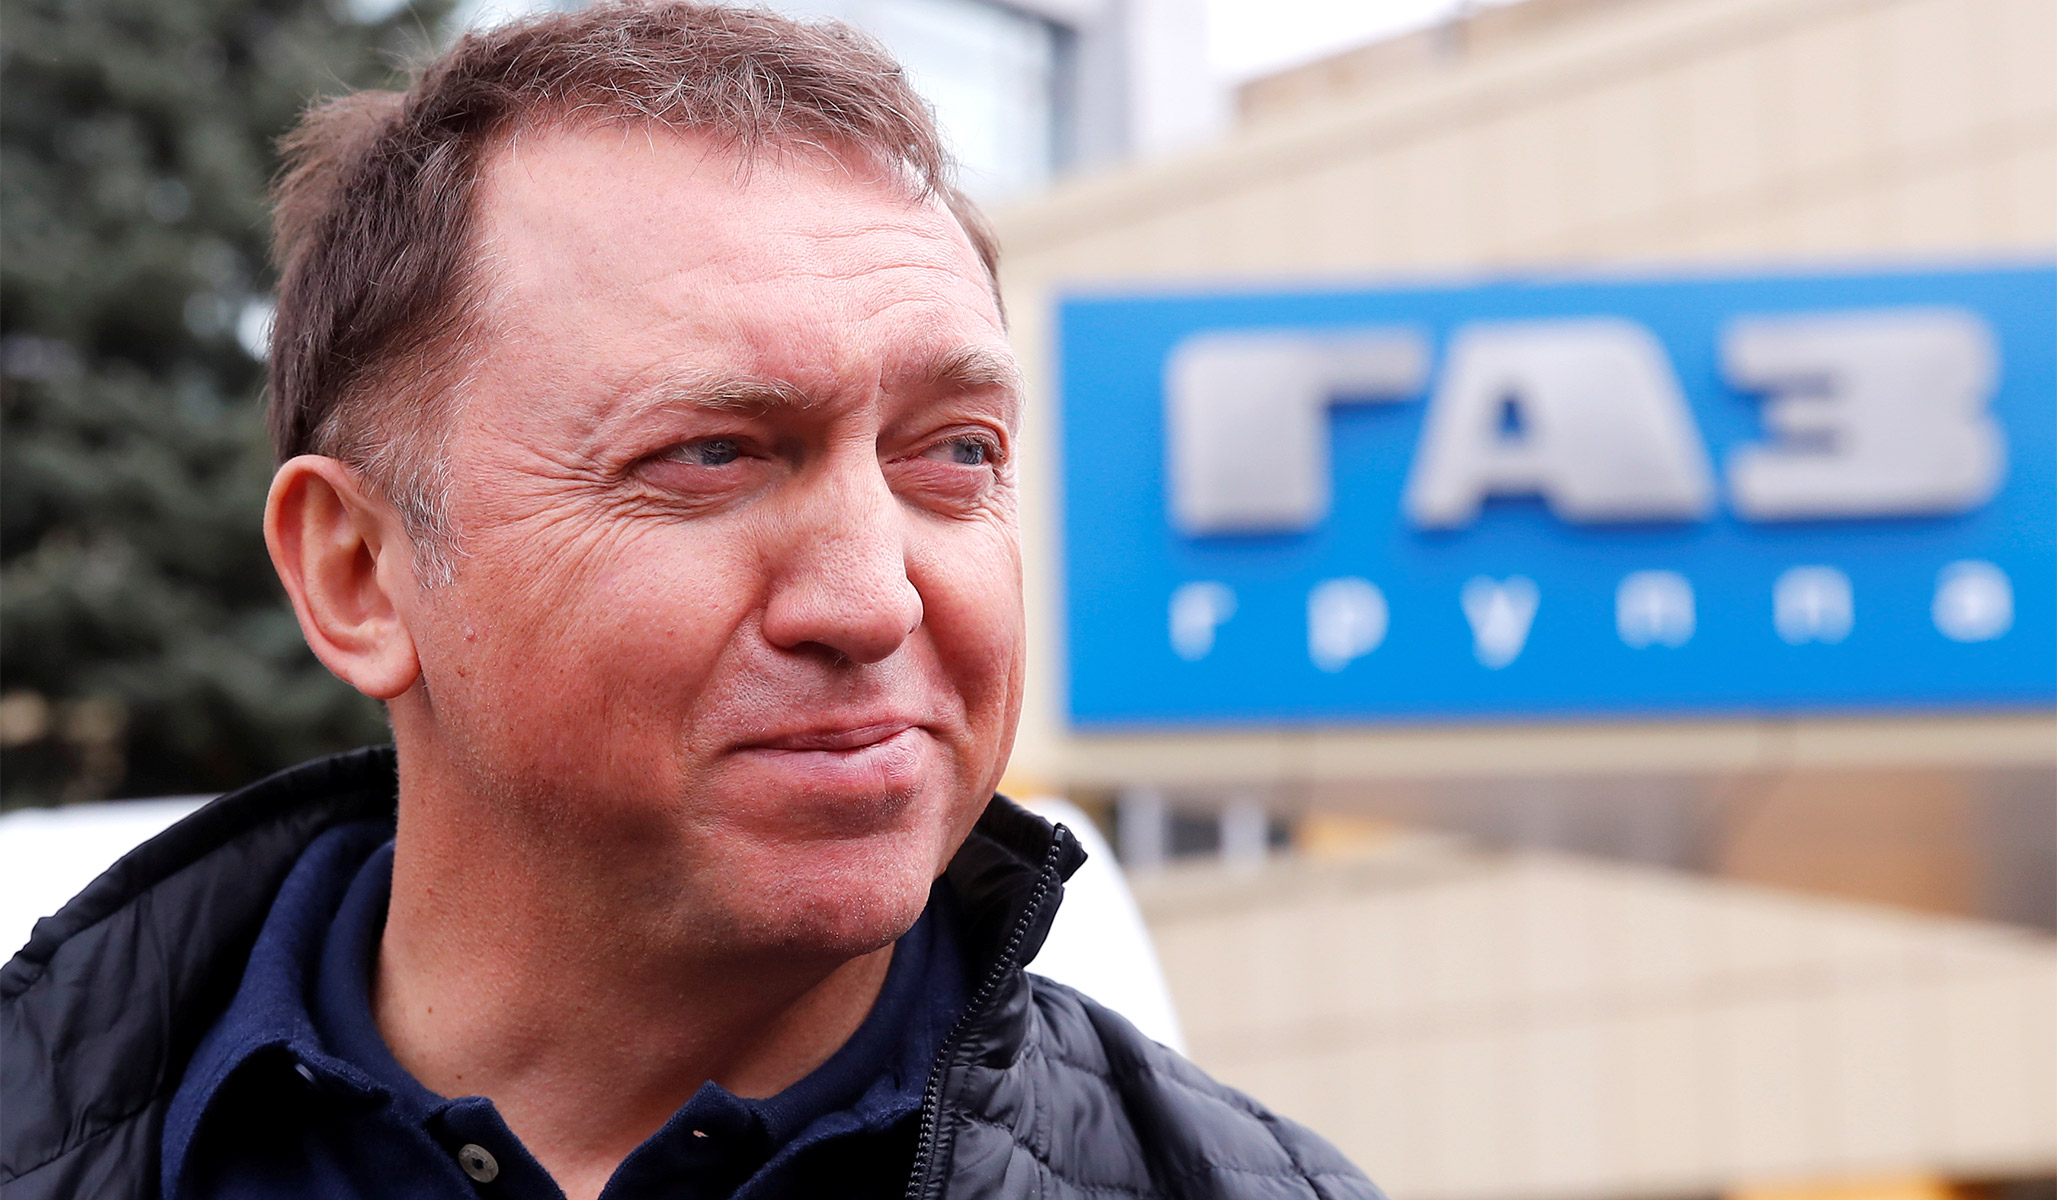 Oleg Laten Porno russian oligarch oleg deripaska scoffed at fbi's collusion